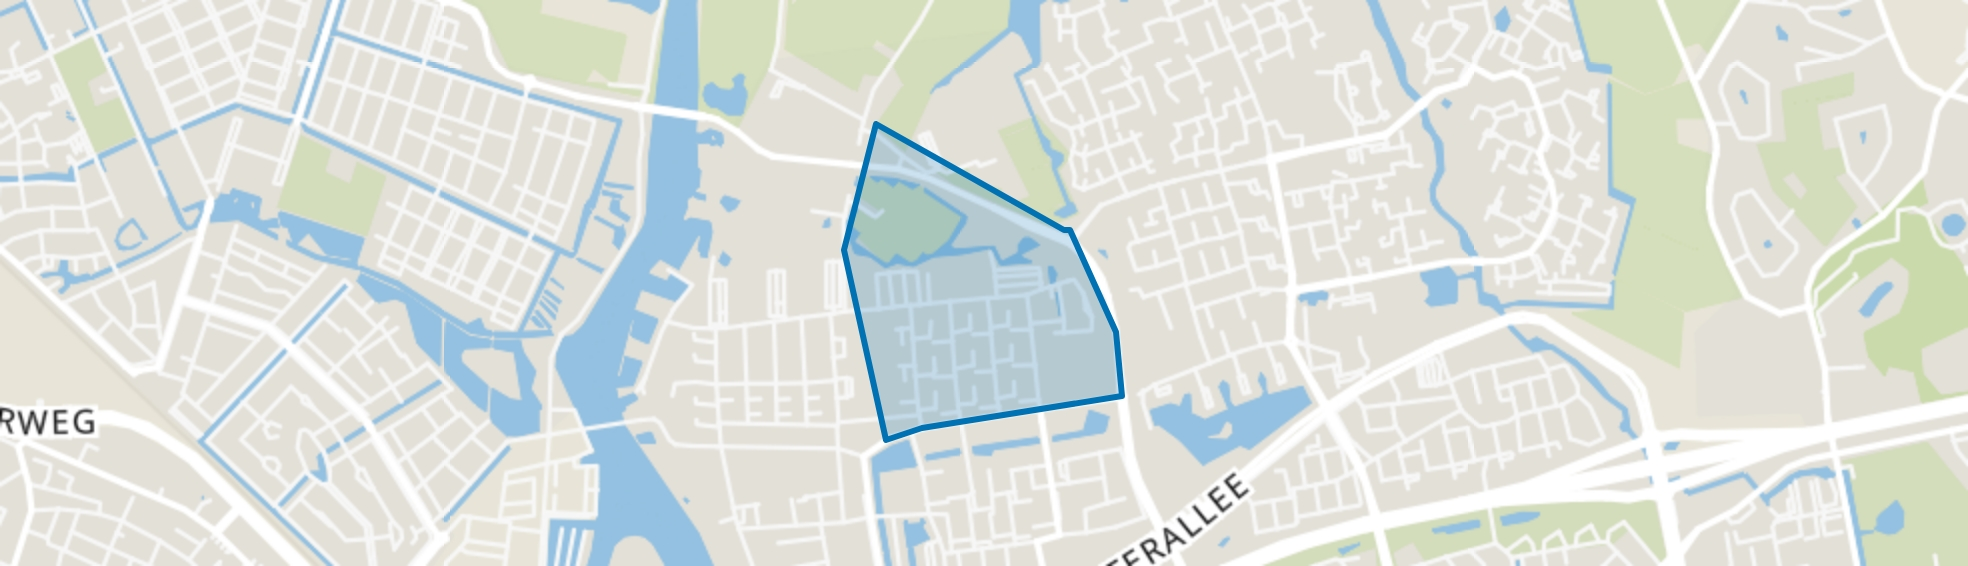 Holtenbroek III, Zwolle map